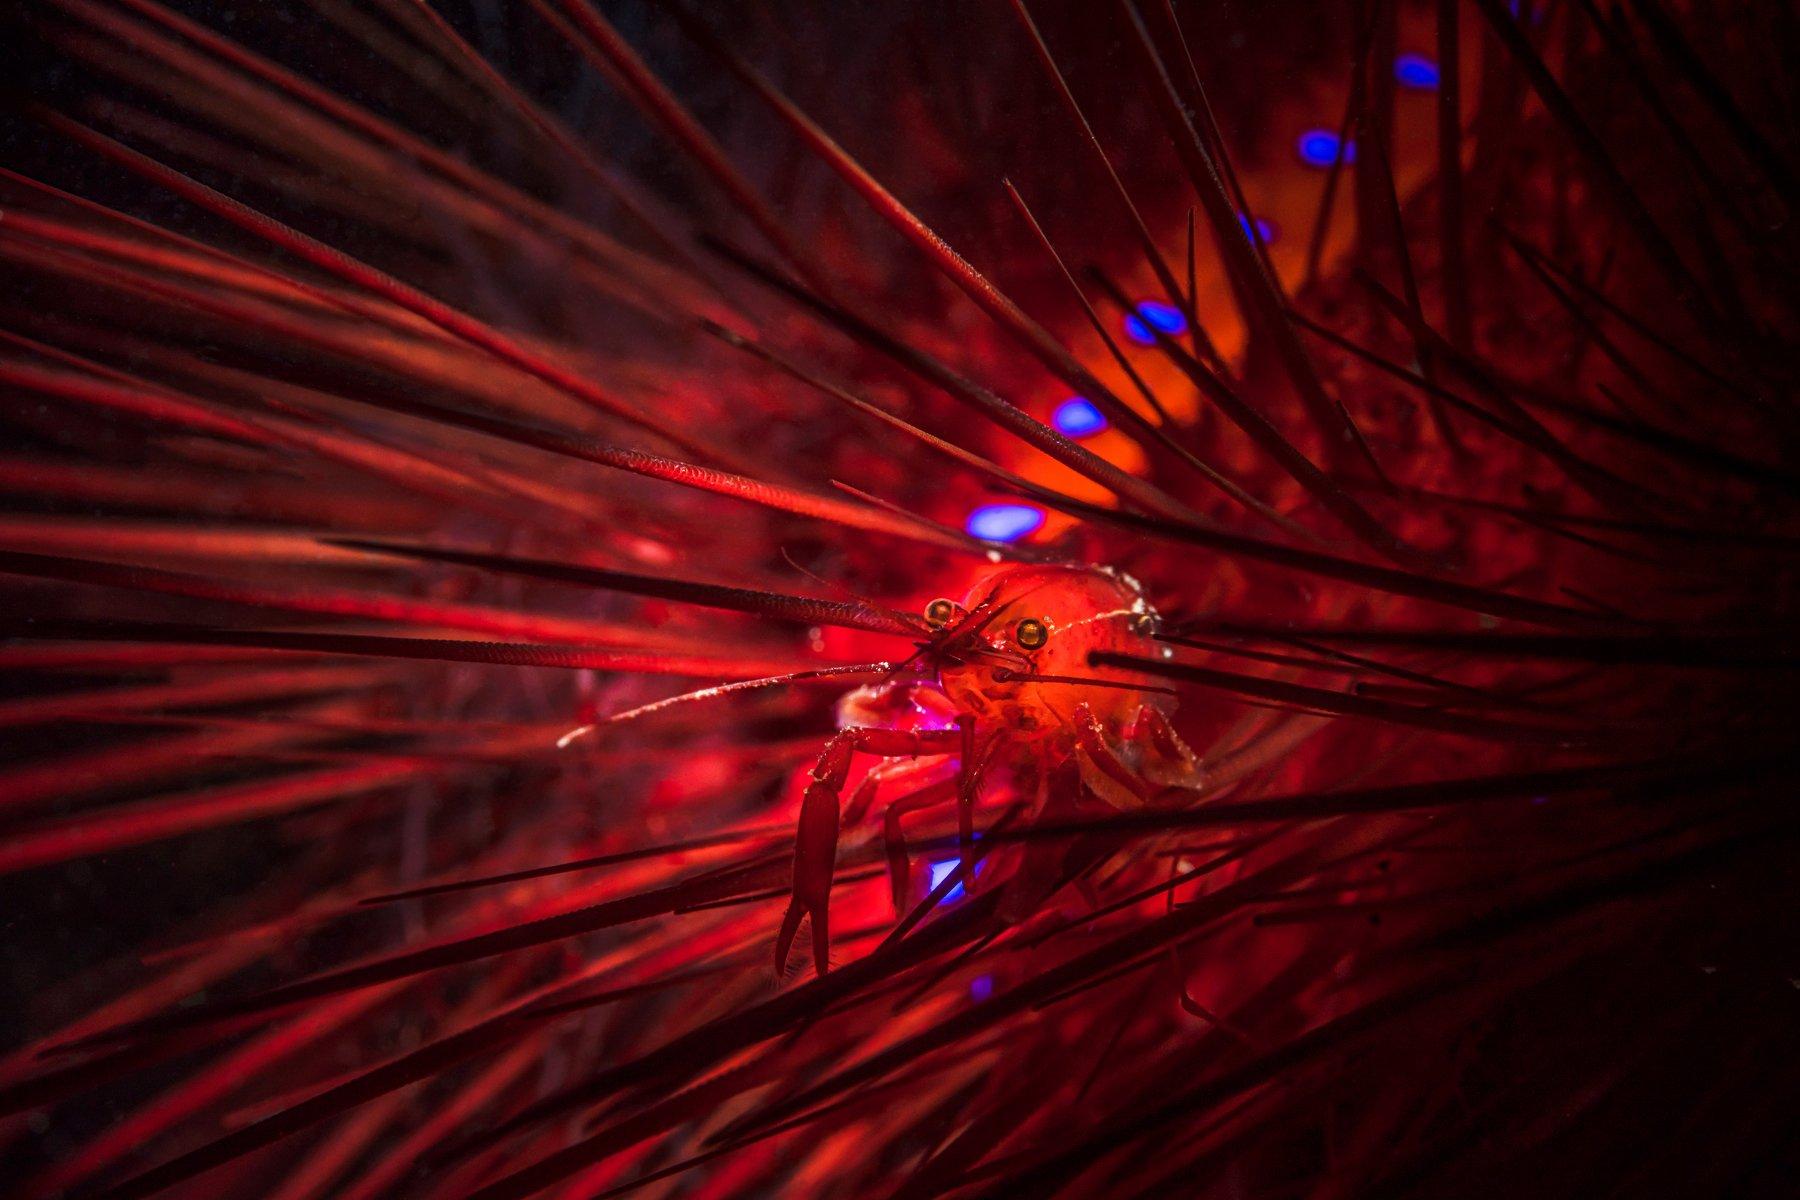 sea urchin, cleaning, shrimp, Савин Андрей